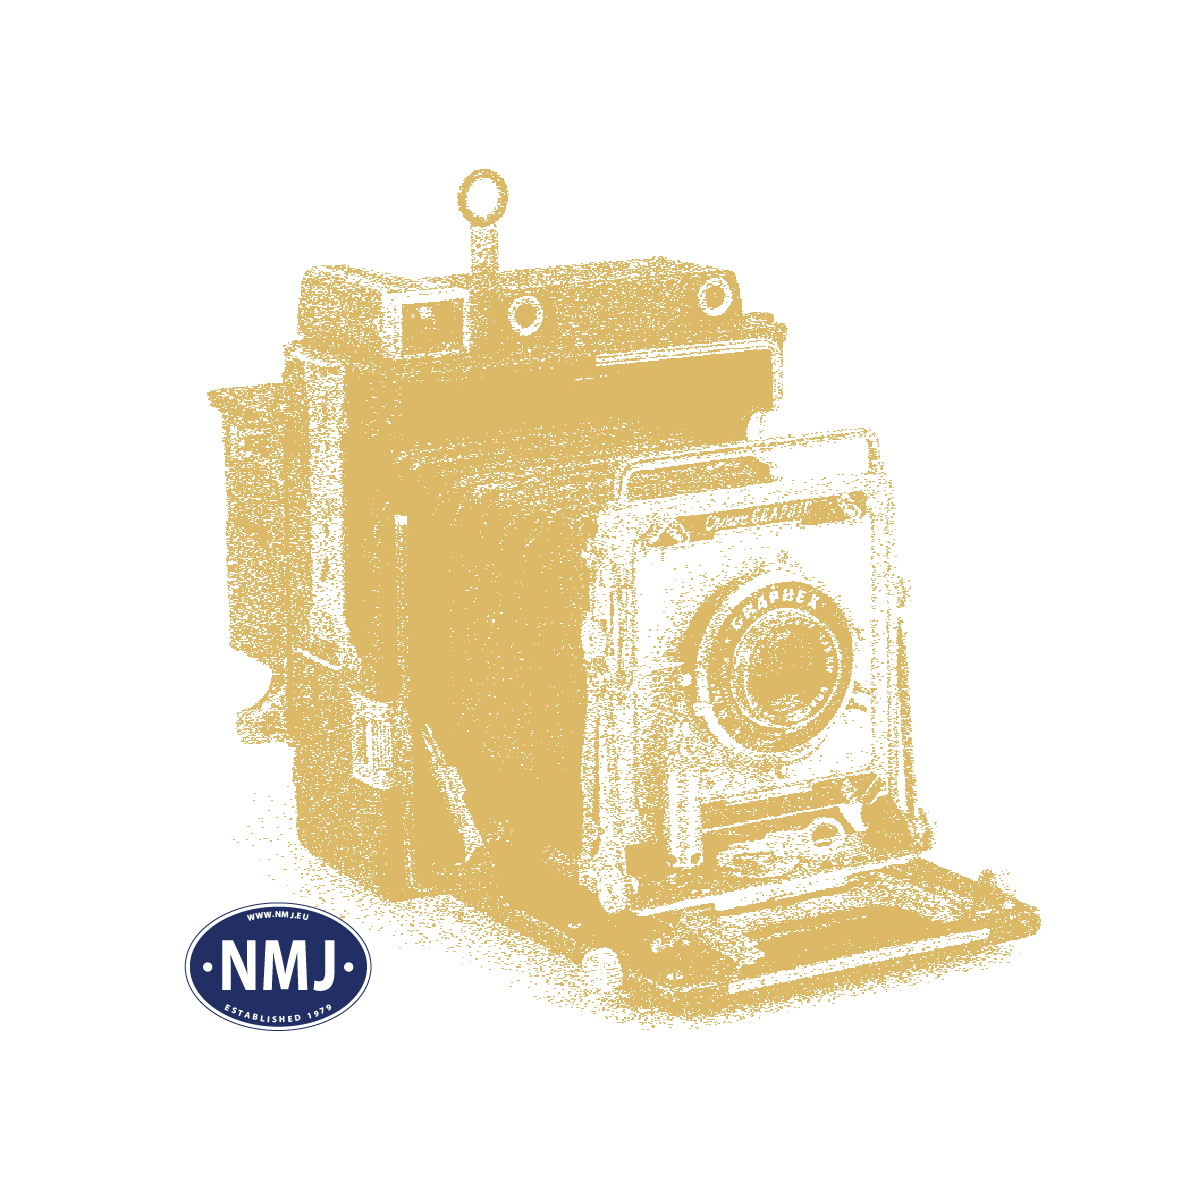 NMJSGF3.6288 - NMJ Superline NSB Gf3 6288